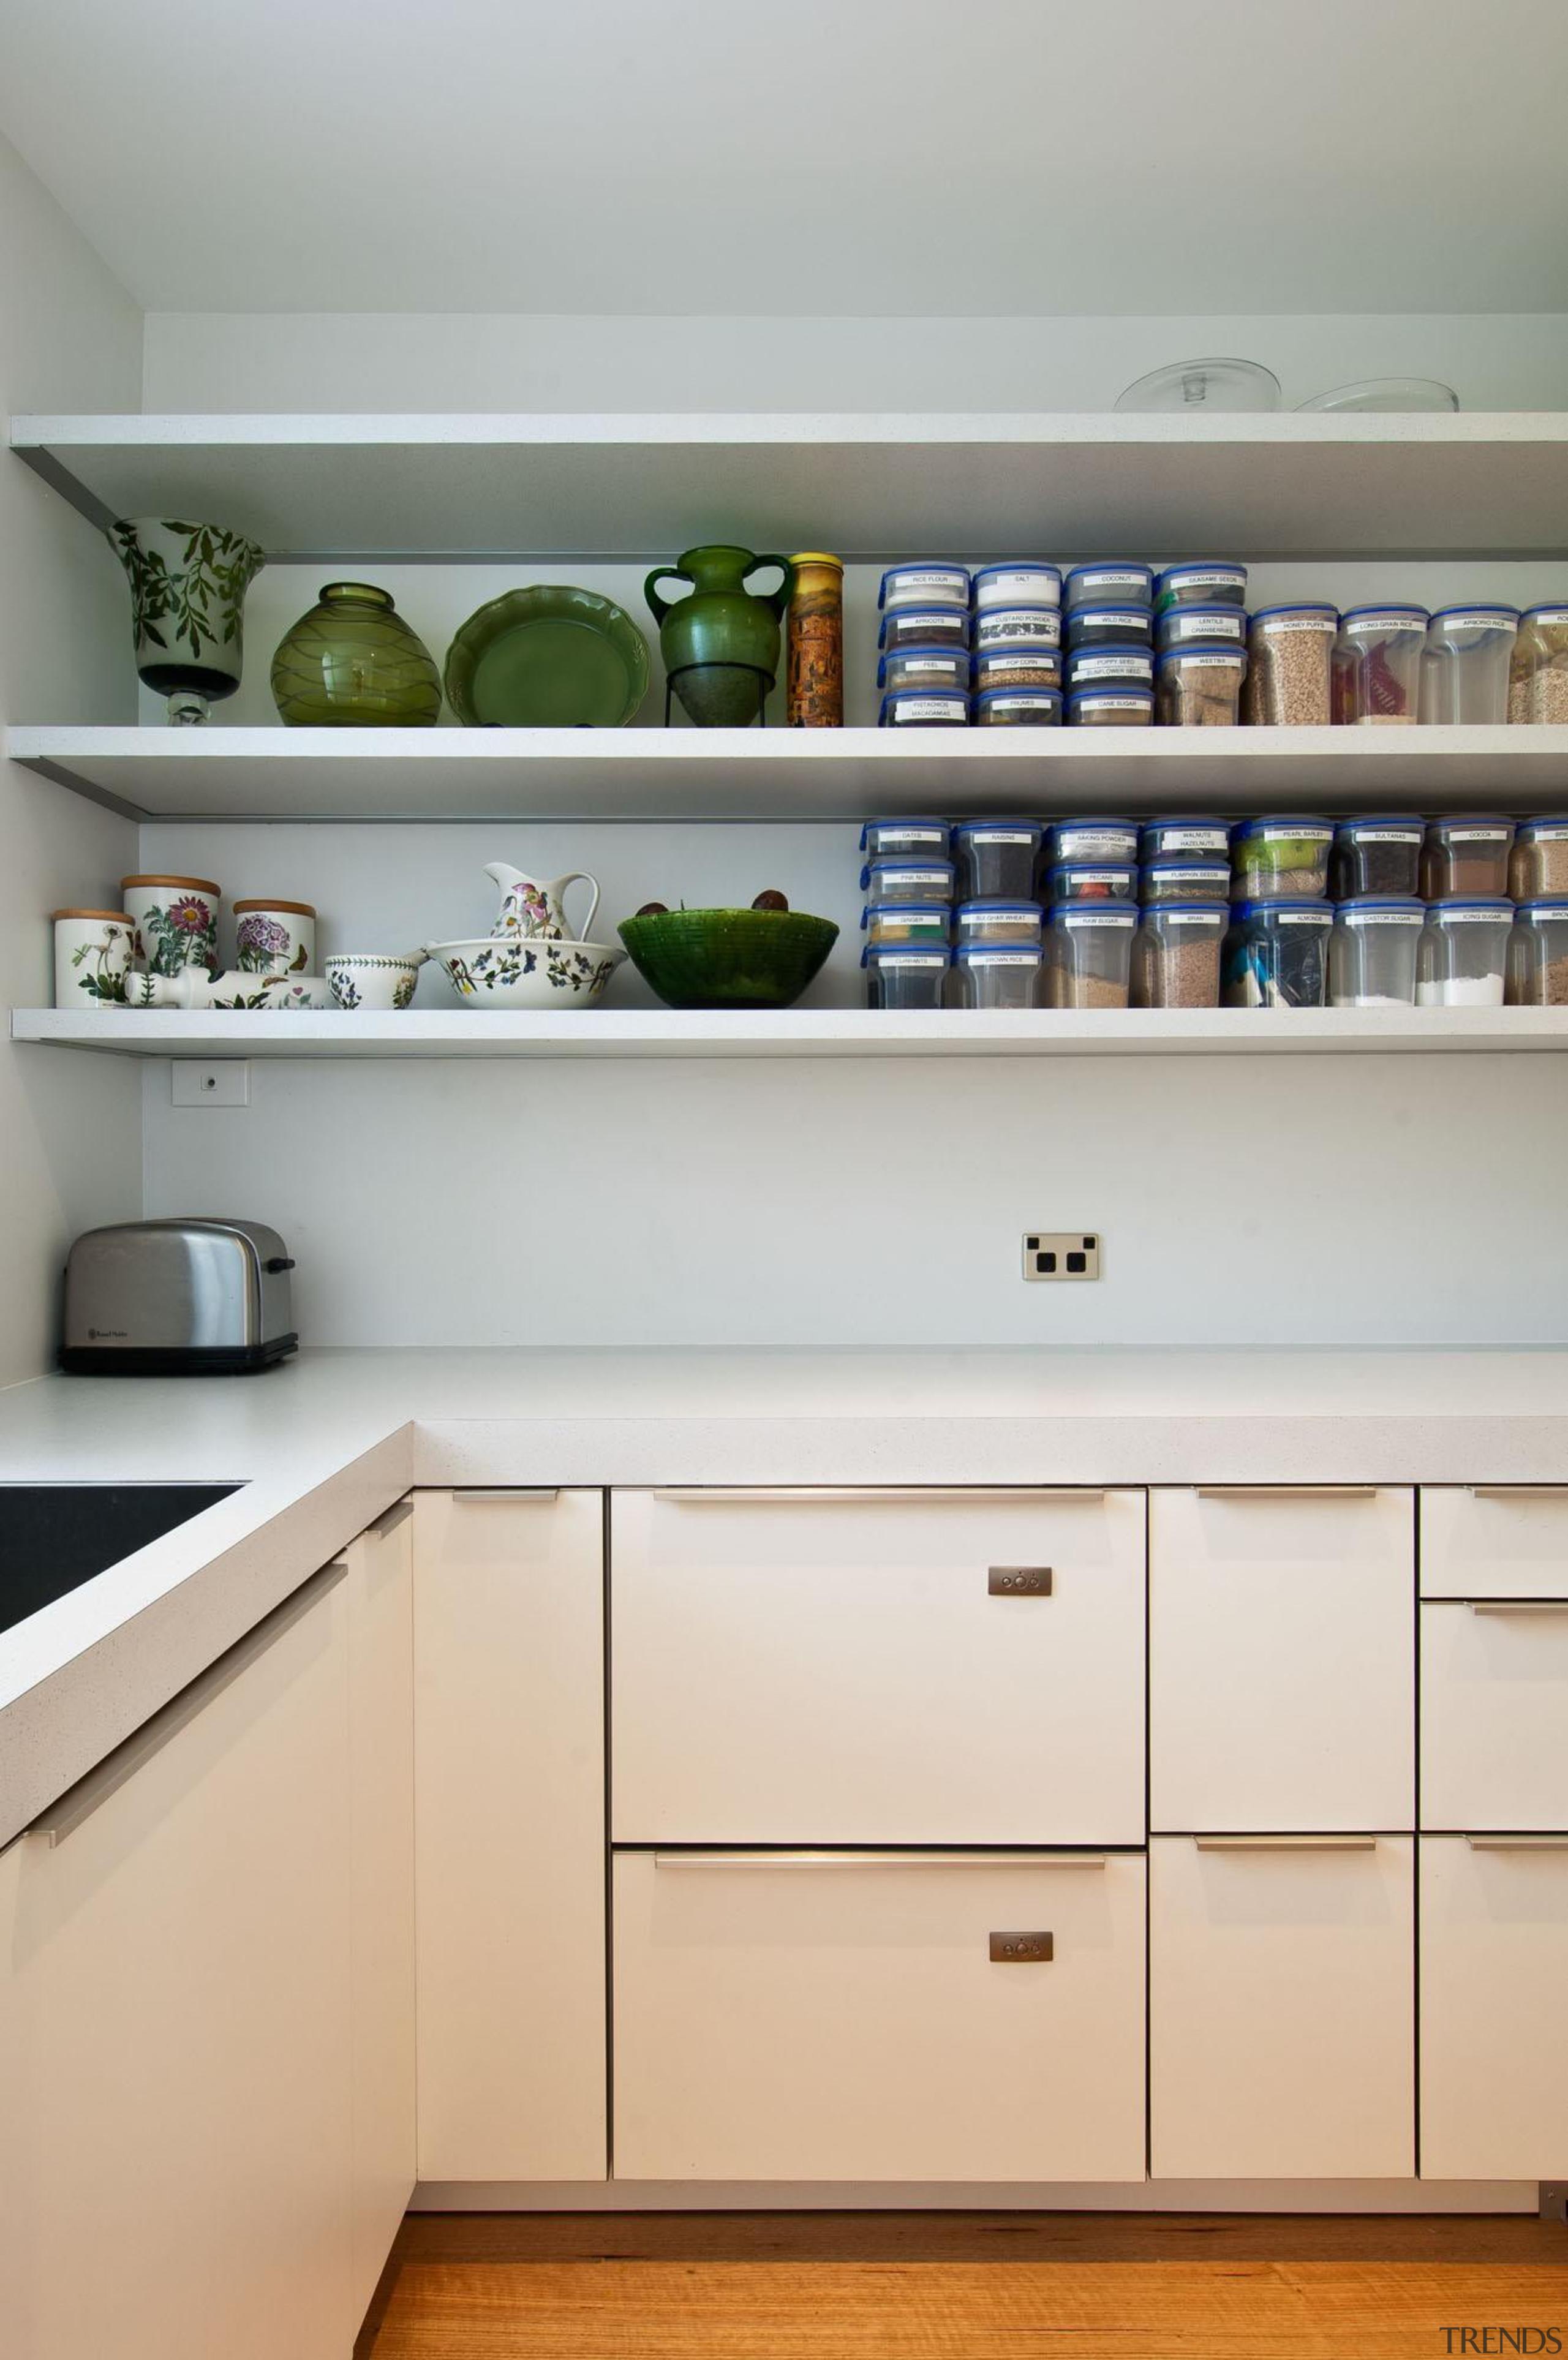 Khandallah Kitchen - Khandallah Kitchen - cabinetry   cabinetry, countertop, furniture, interior design, kitchen, room, shelf, shelving, gray